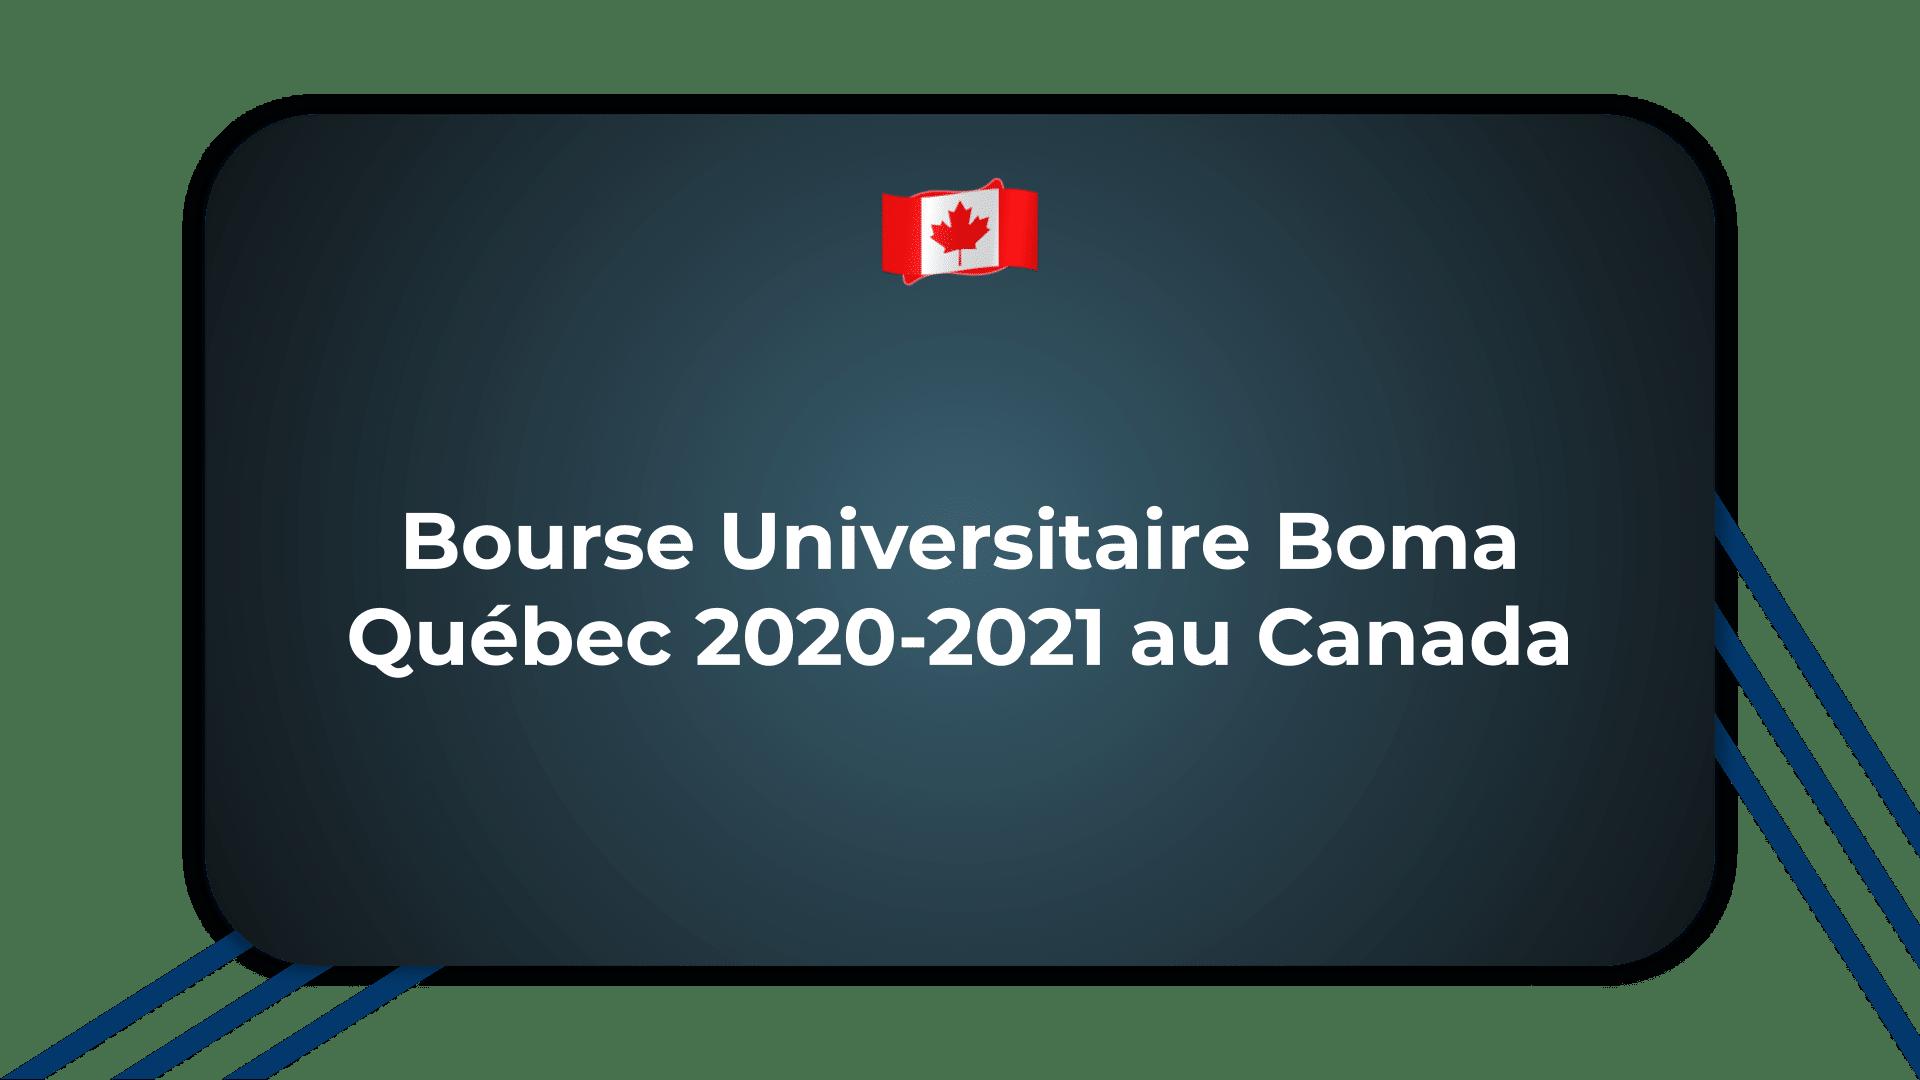 Bourse Universitaire Boma Québec